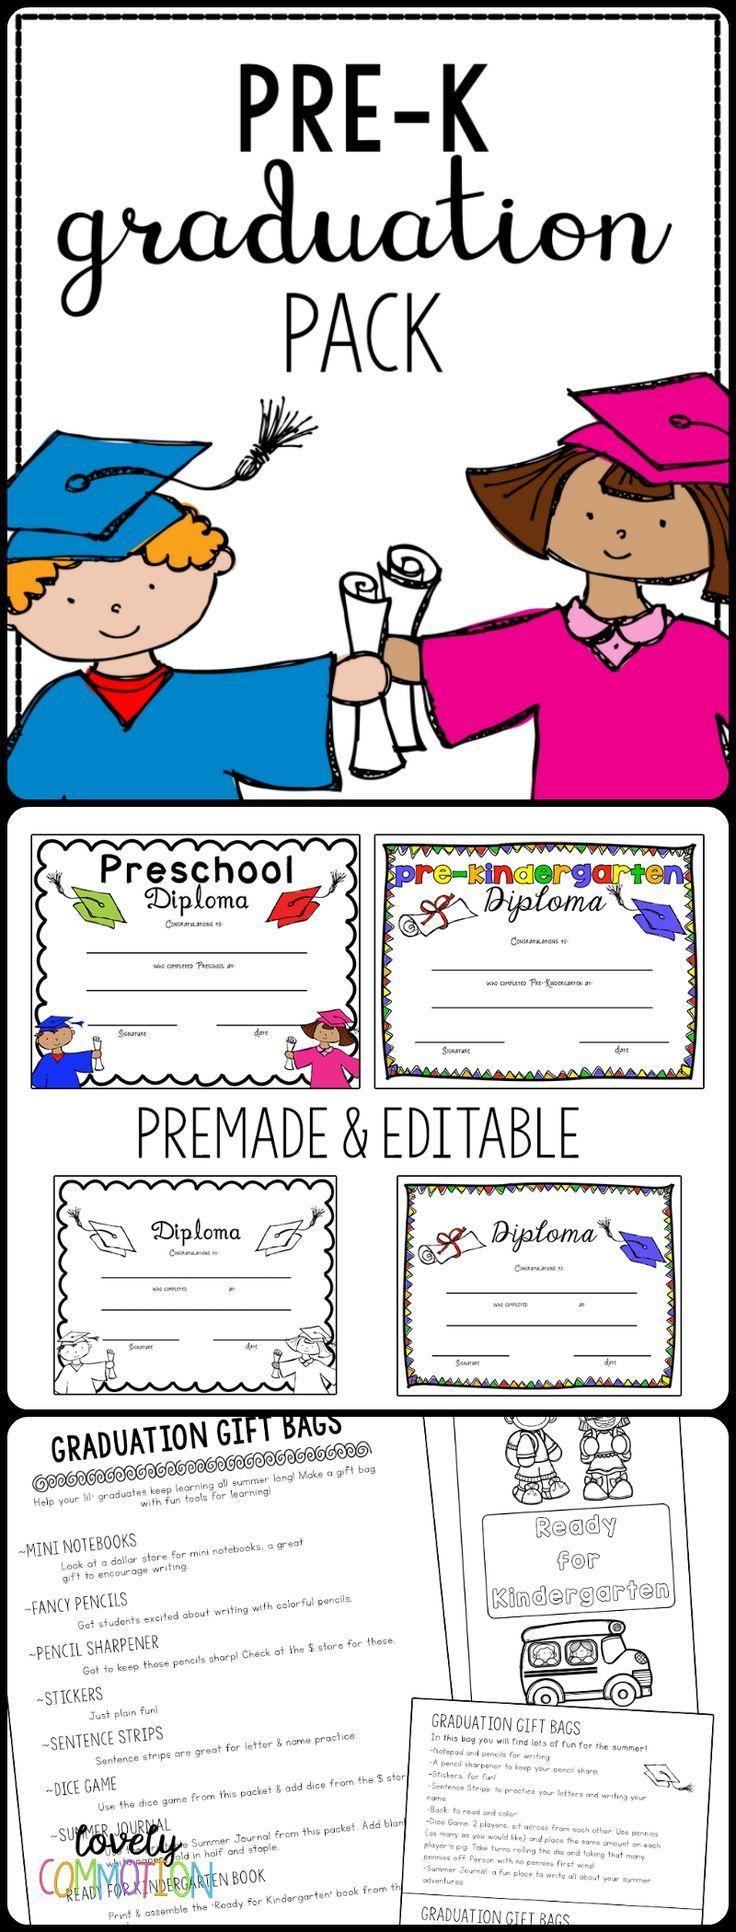 Preschool And Pre K Graduation Pack With Certificate Preschool Graduation Preschool Diploma Pre K Graduation [ 1932 x 736 Pixel ]